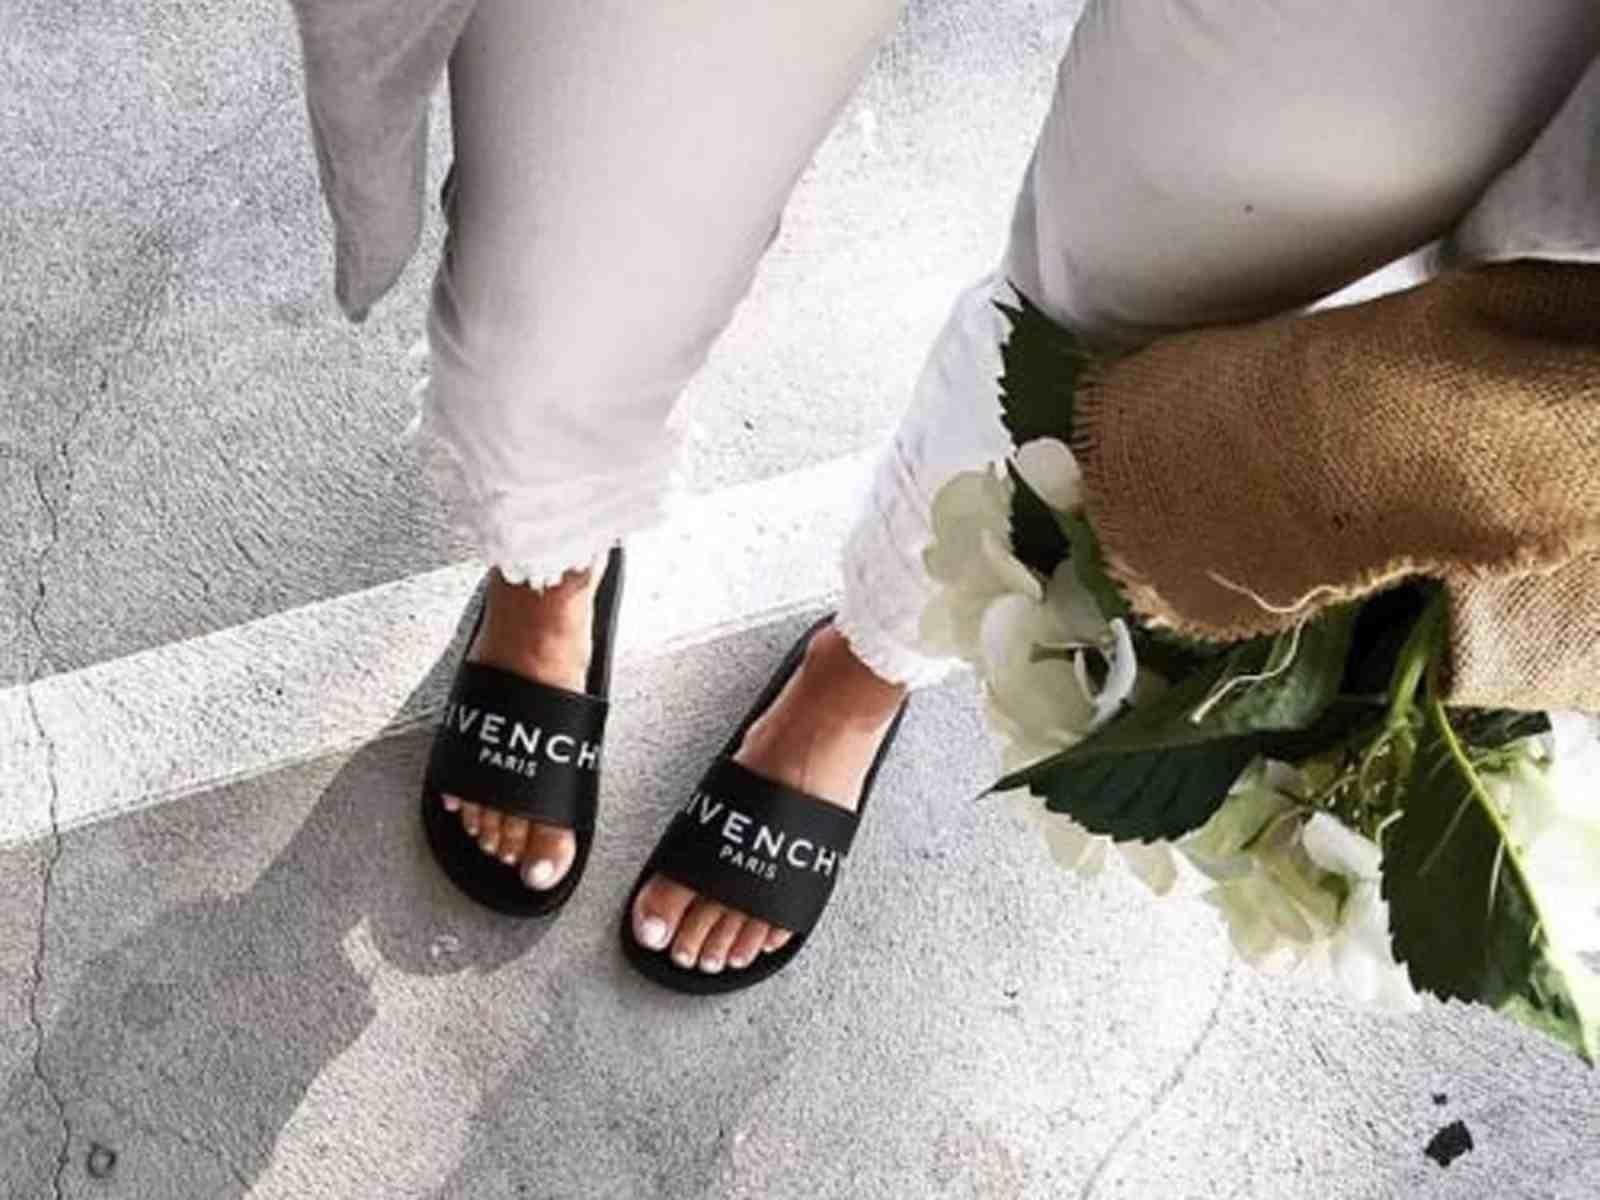 20 Ways To Wear Women's Slide Sandals This Summer - Society19